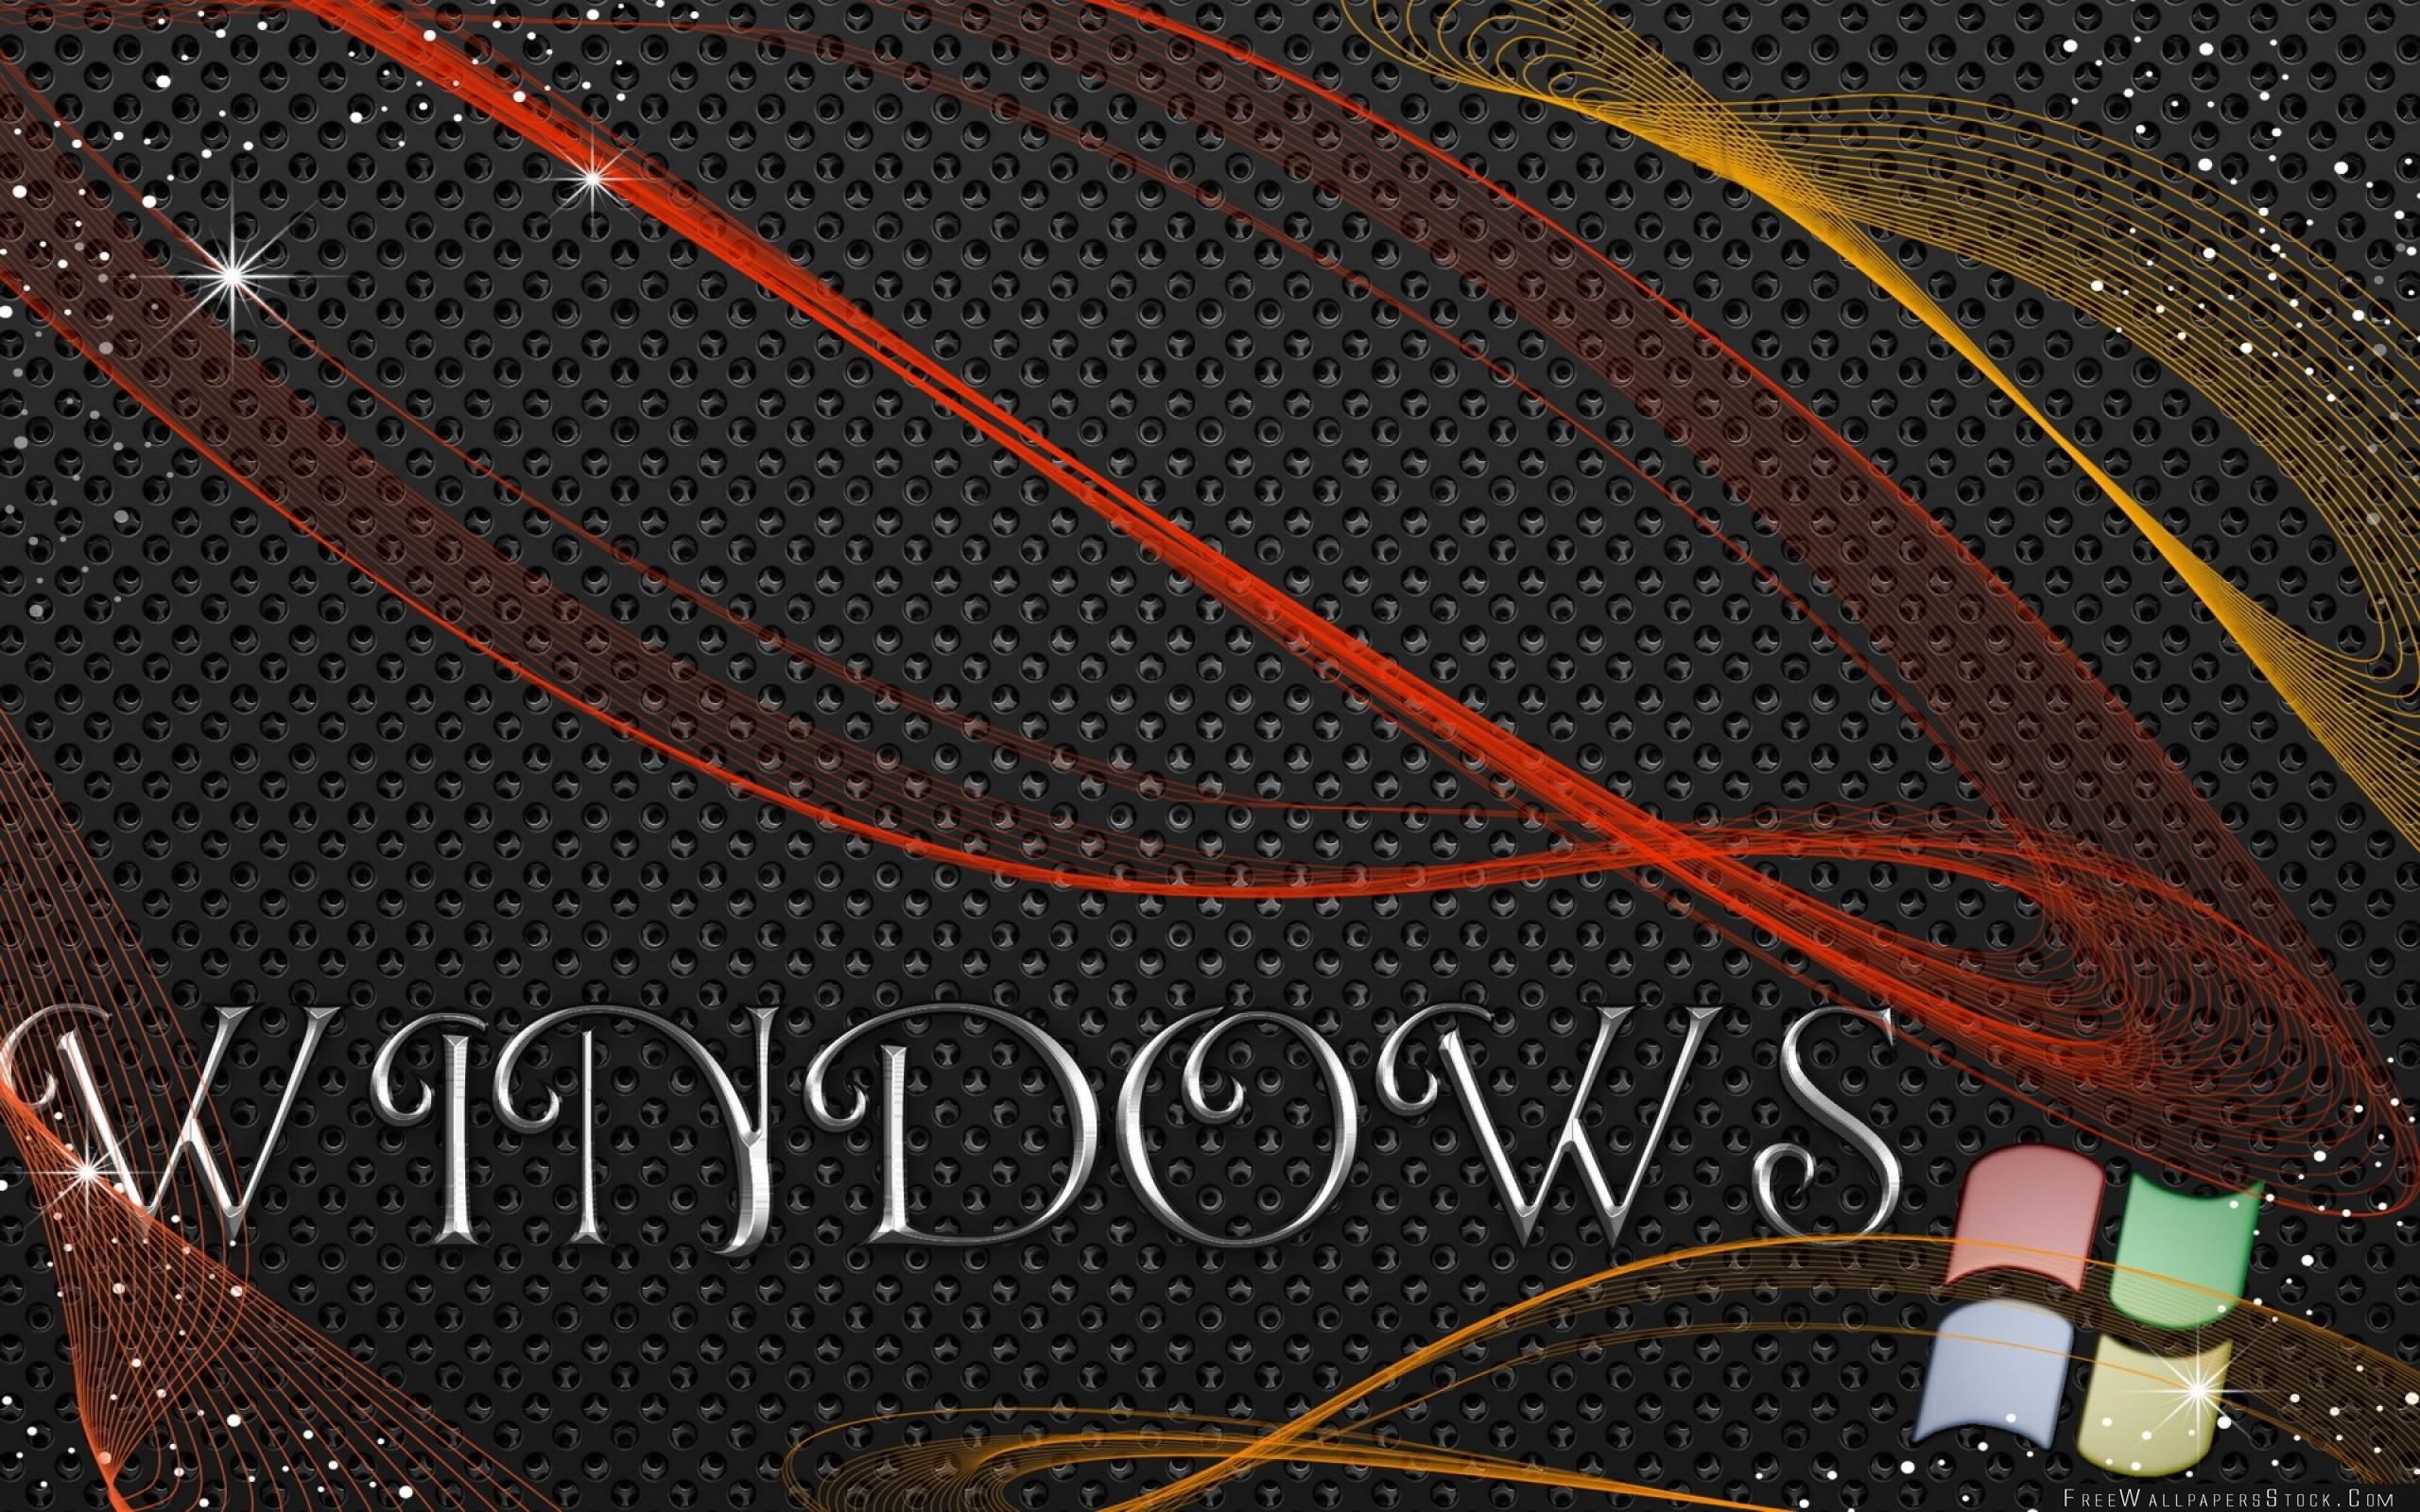 Download Free Wallpaper Windows Background Patterns